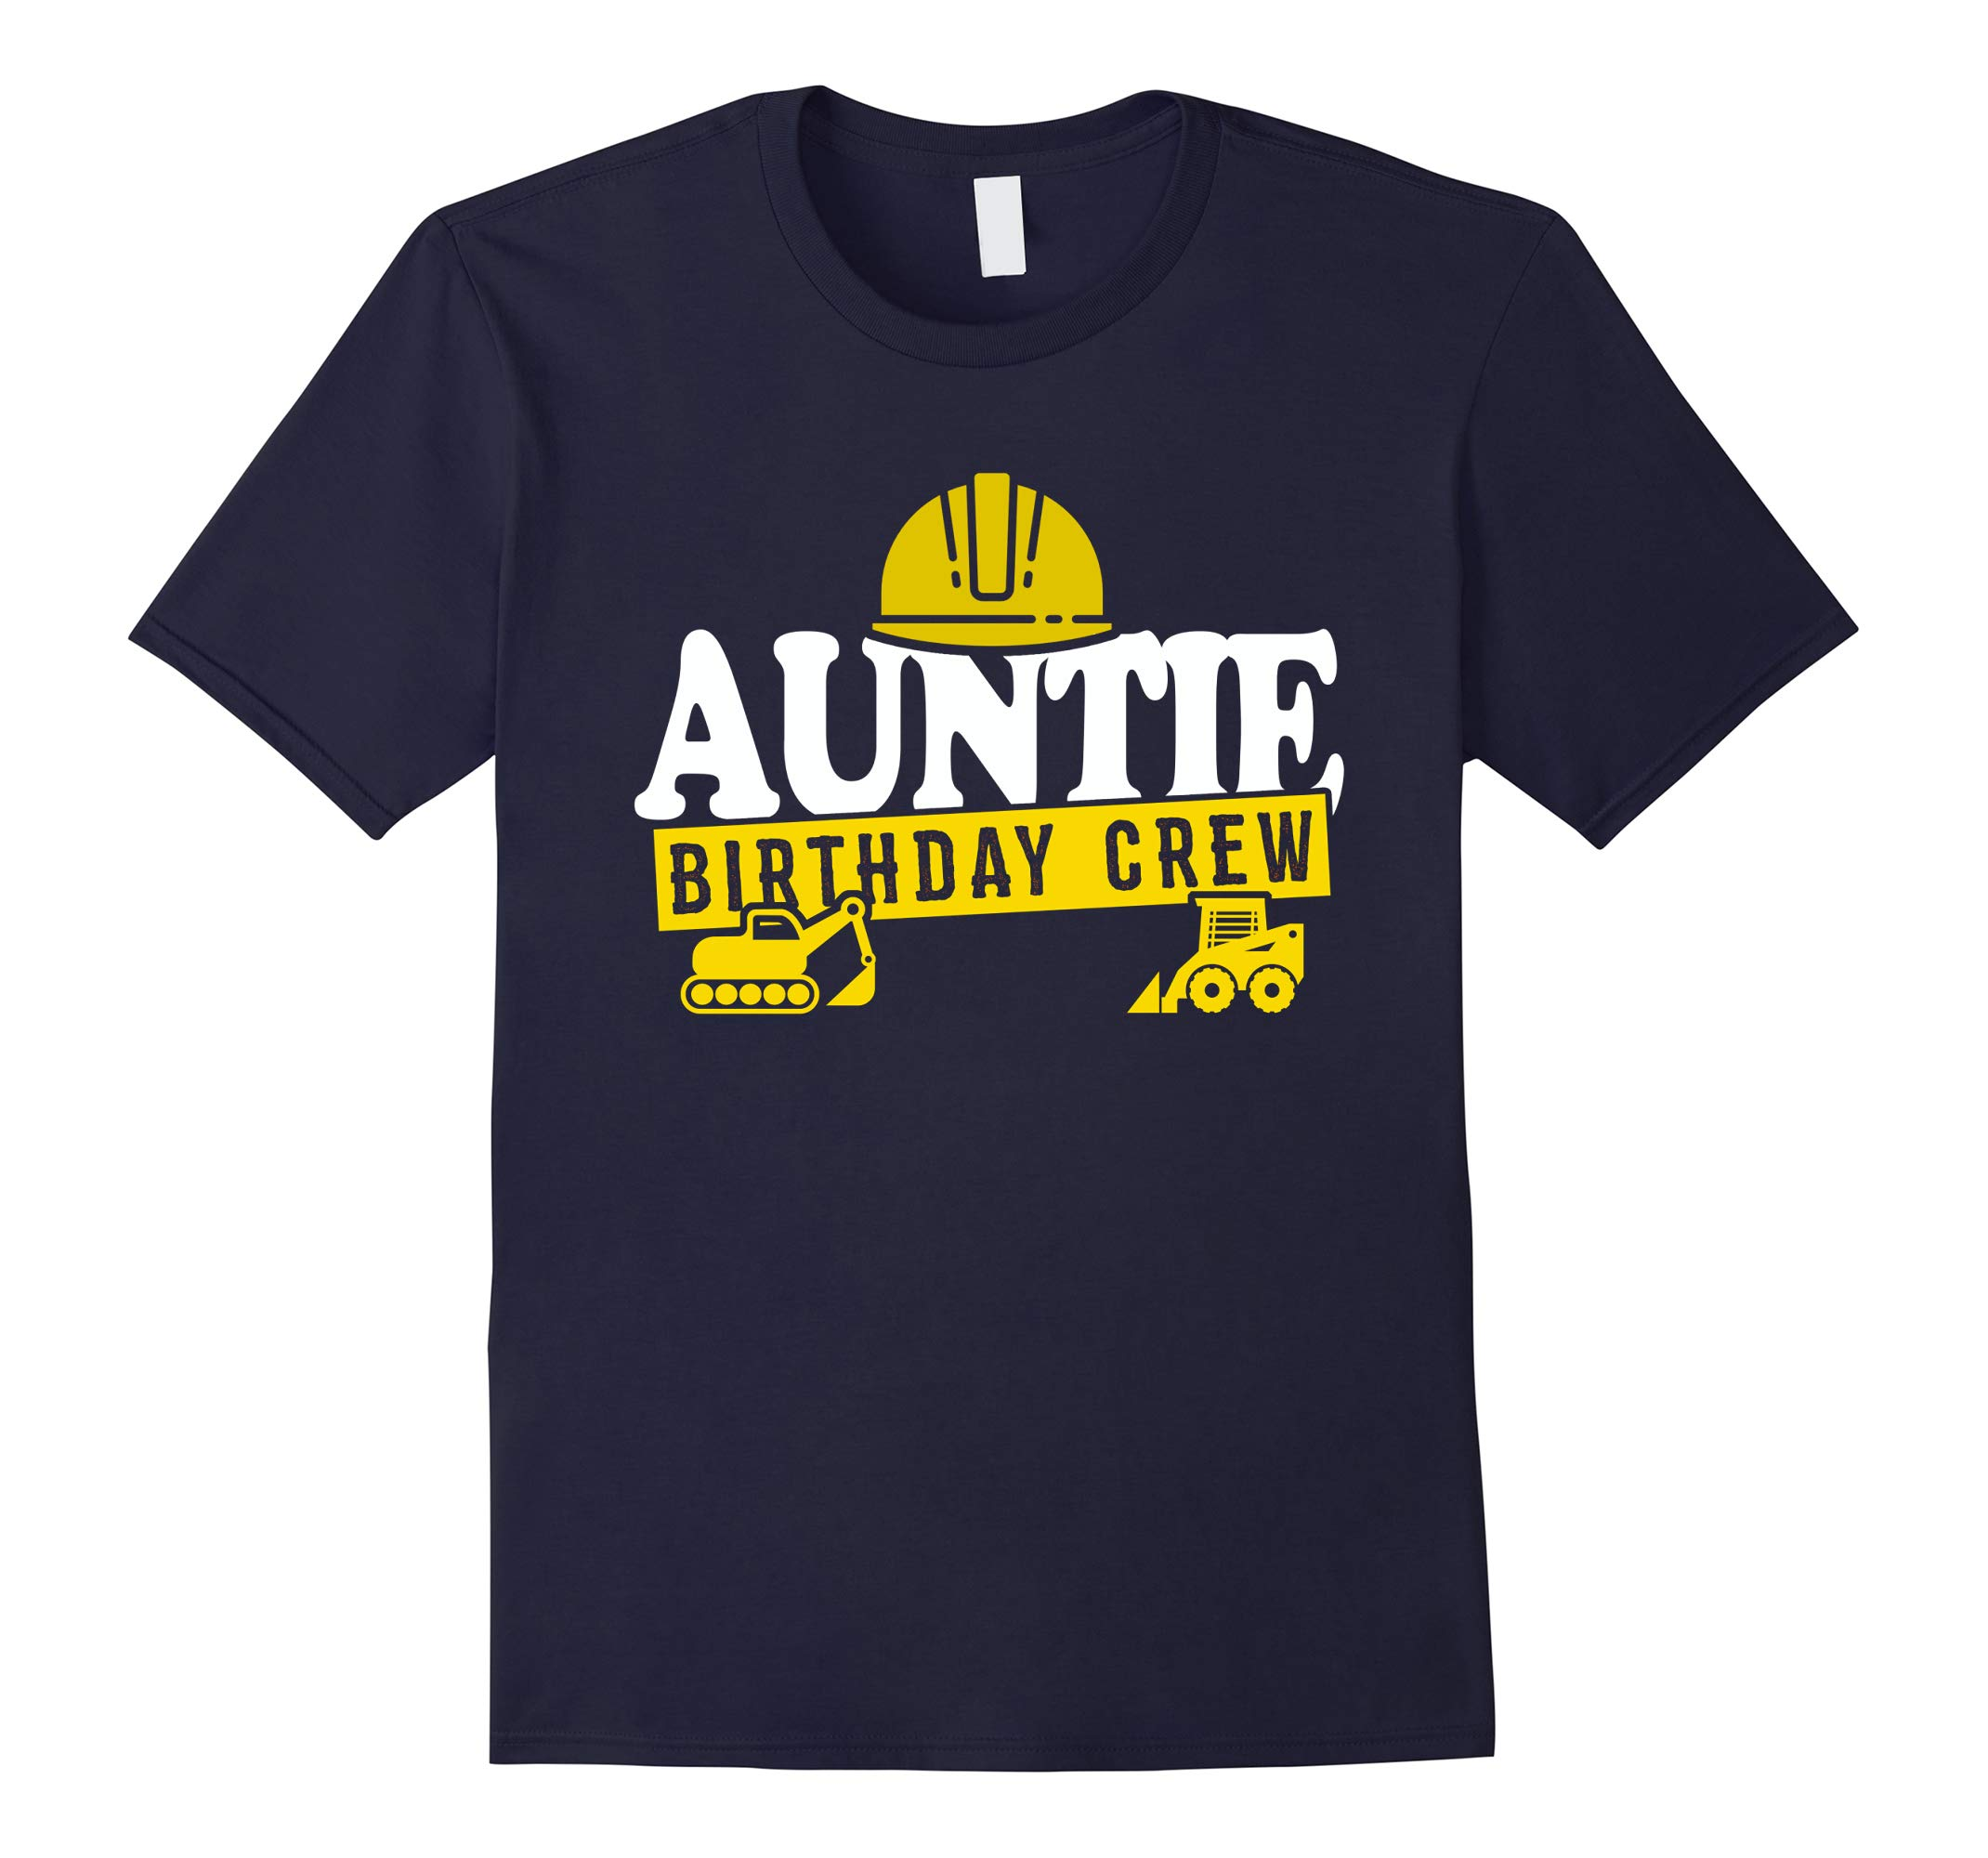 Auntie Birthday Crew T-Shirt Construction Theme Bday Party-RT